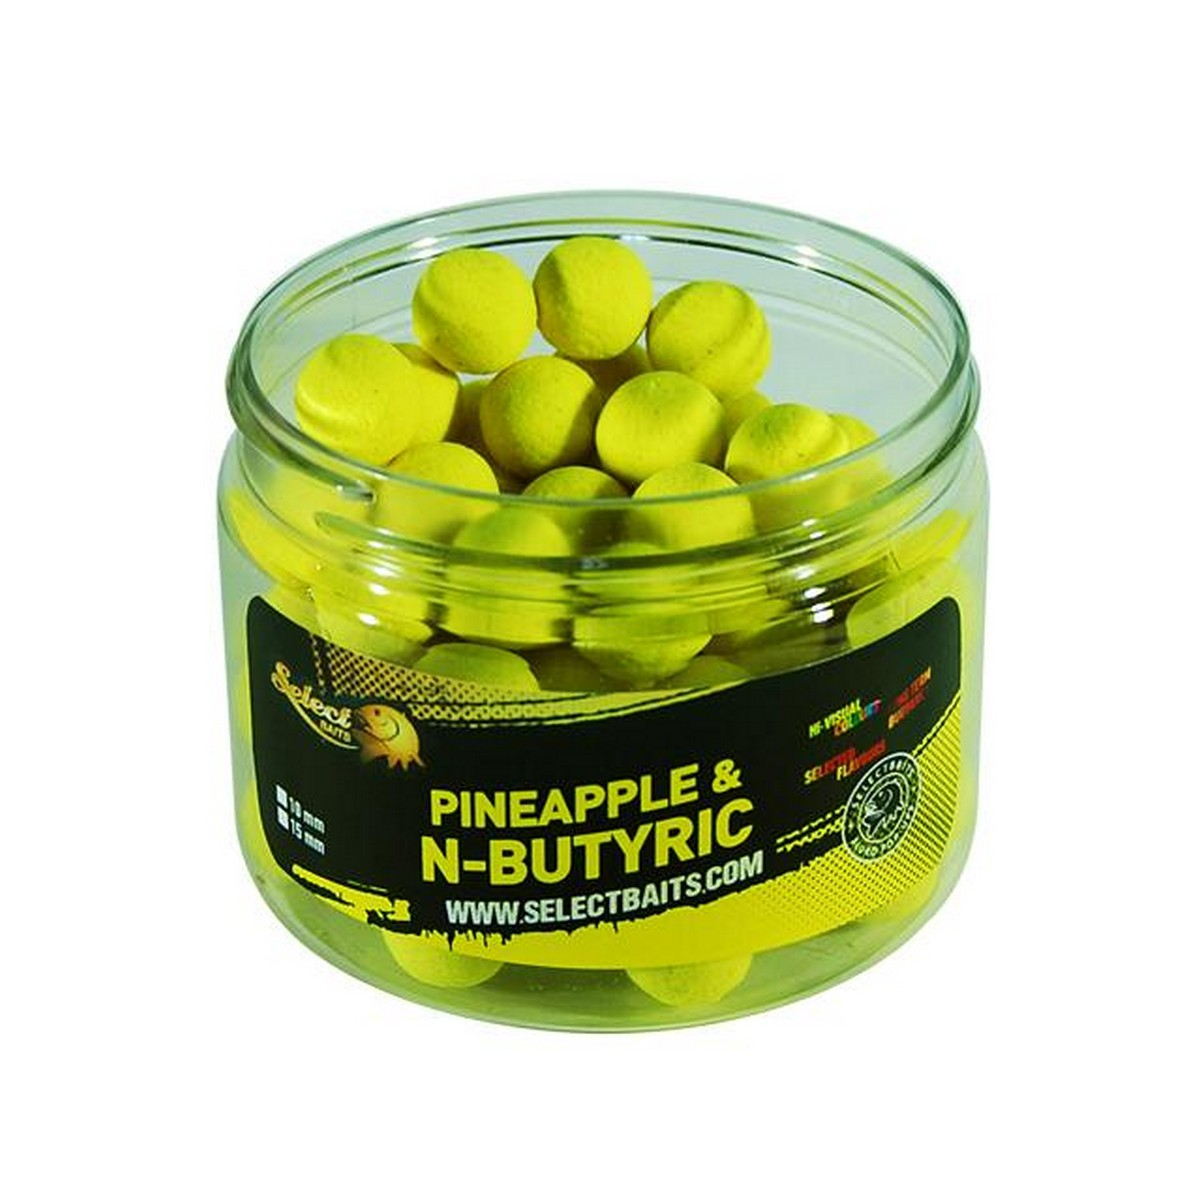 Select Baits Fluoro Yellow Pineapple & N-Butyric Pop-up – плуващи топчета